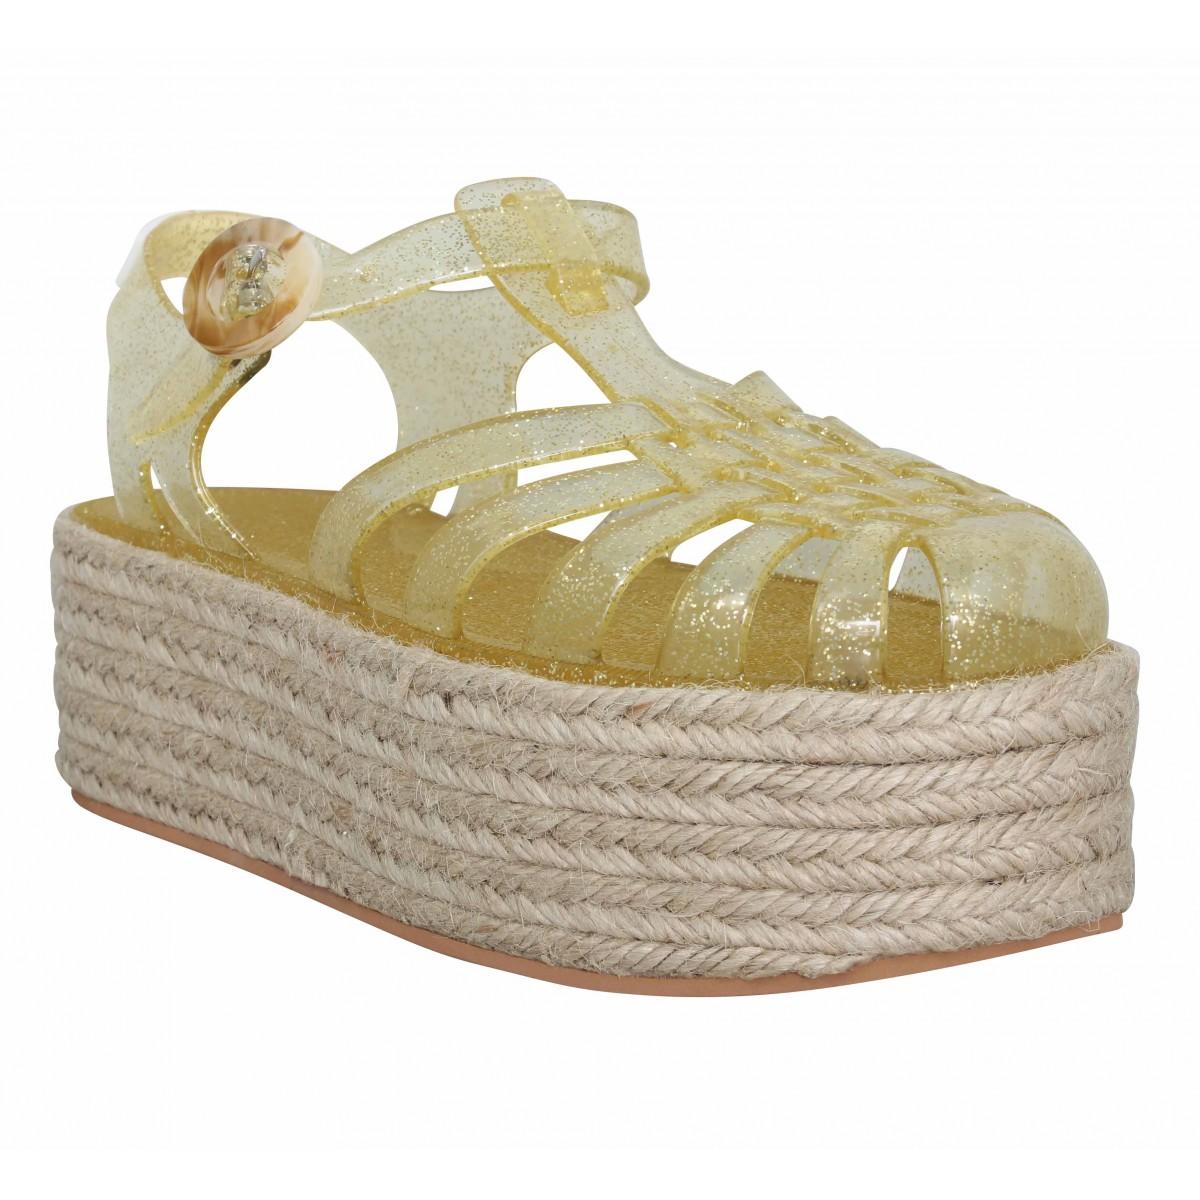 Sandales talons NO NAME X MEDUSE Calypso Meduse jelly Femme Gold